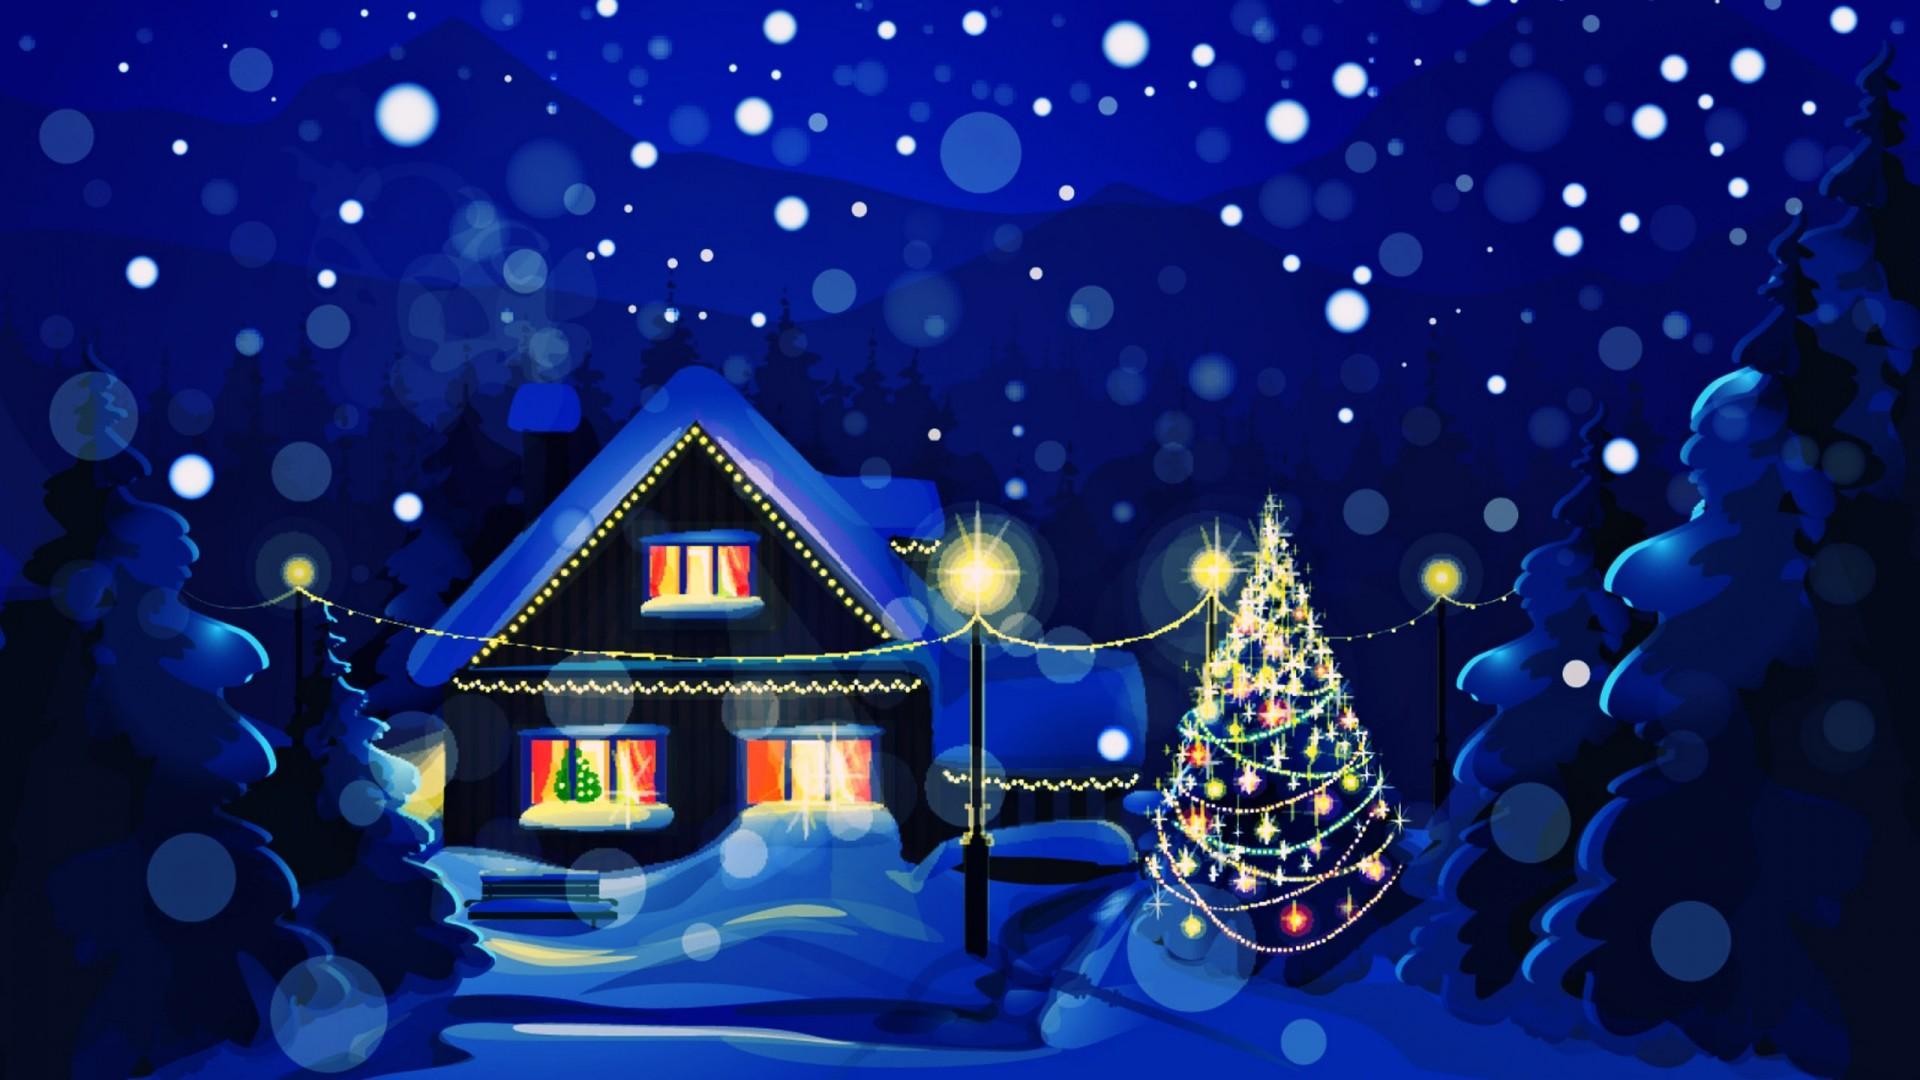 blue animated christmas wallpaper